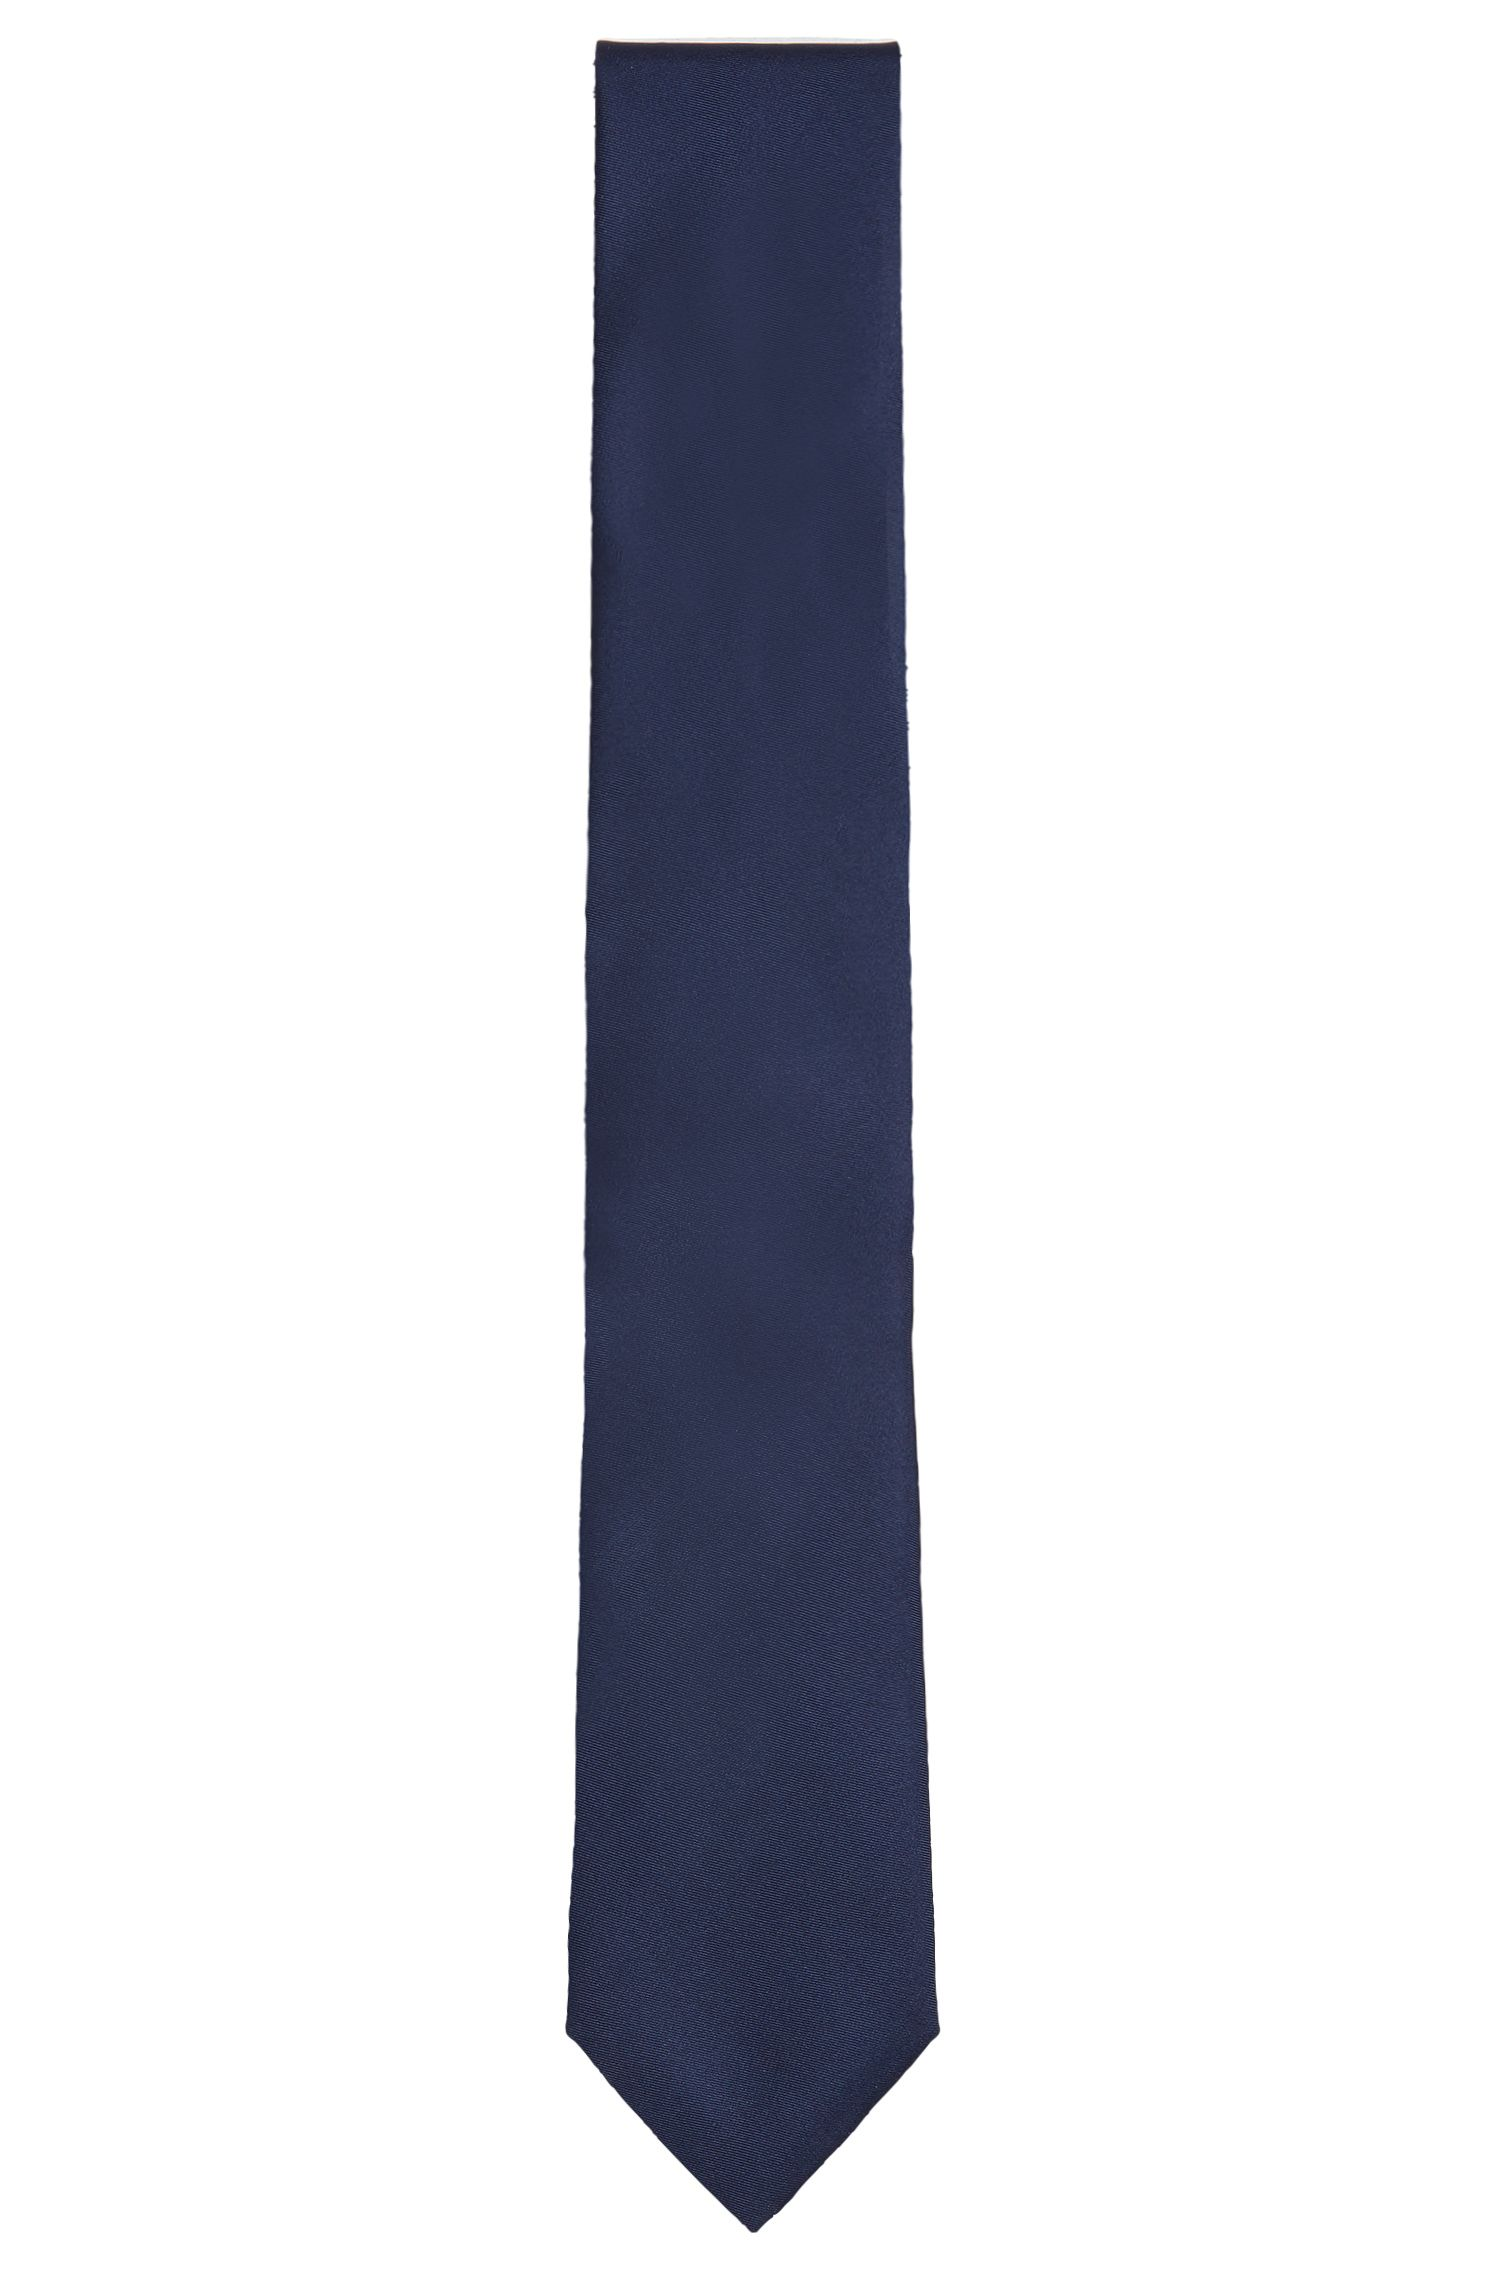 Corbata lisa de seda con textura estriada: 'Tie 7 cm'